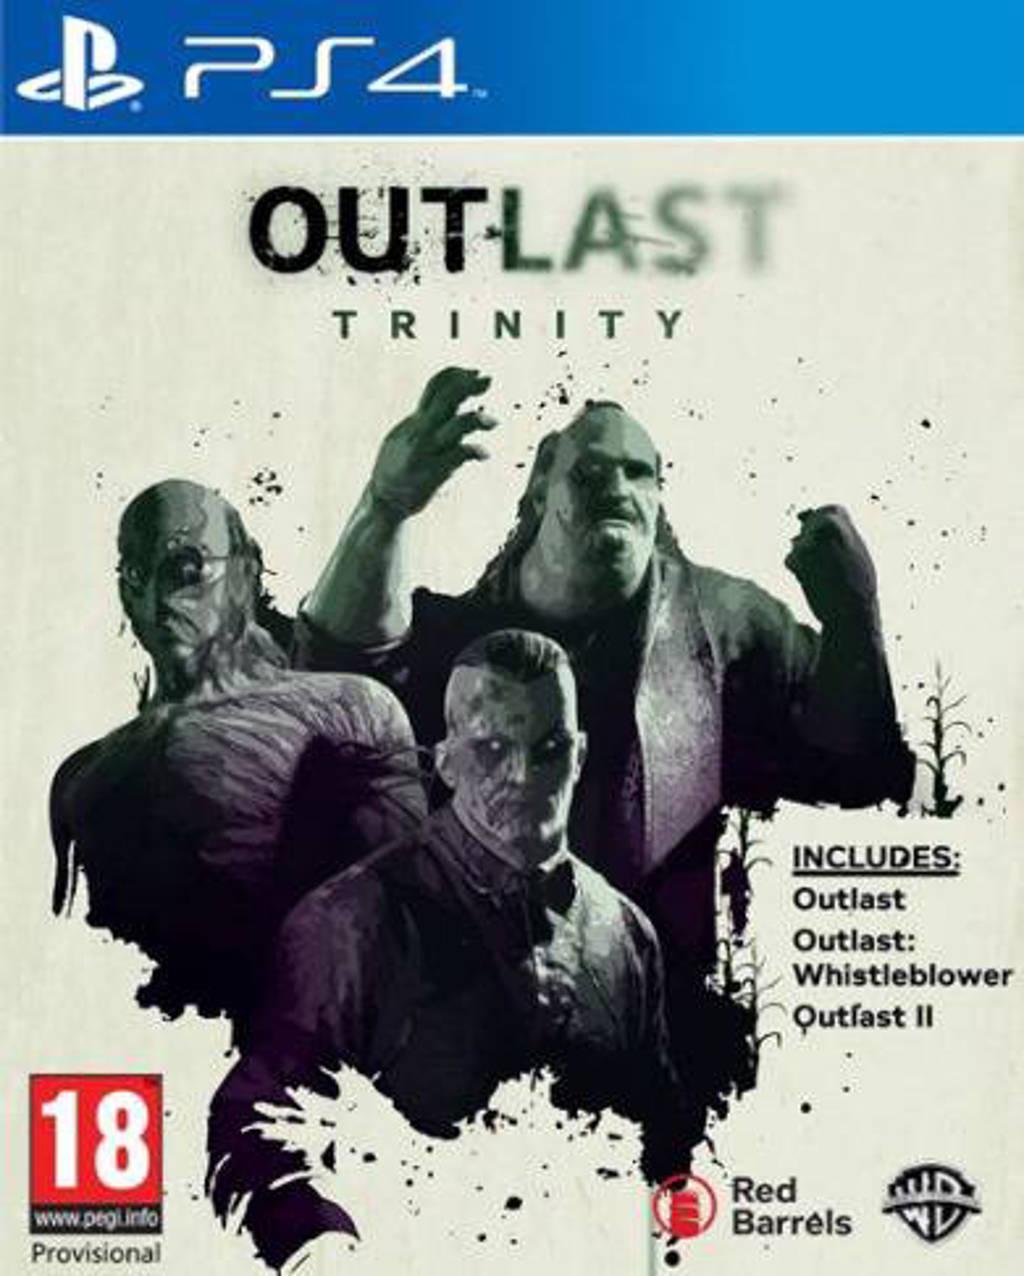 Outlast trinity (PlayStation 4)